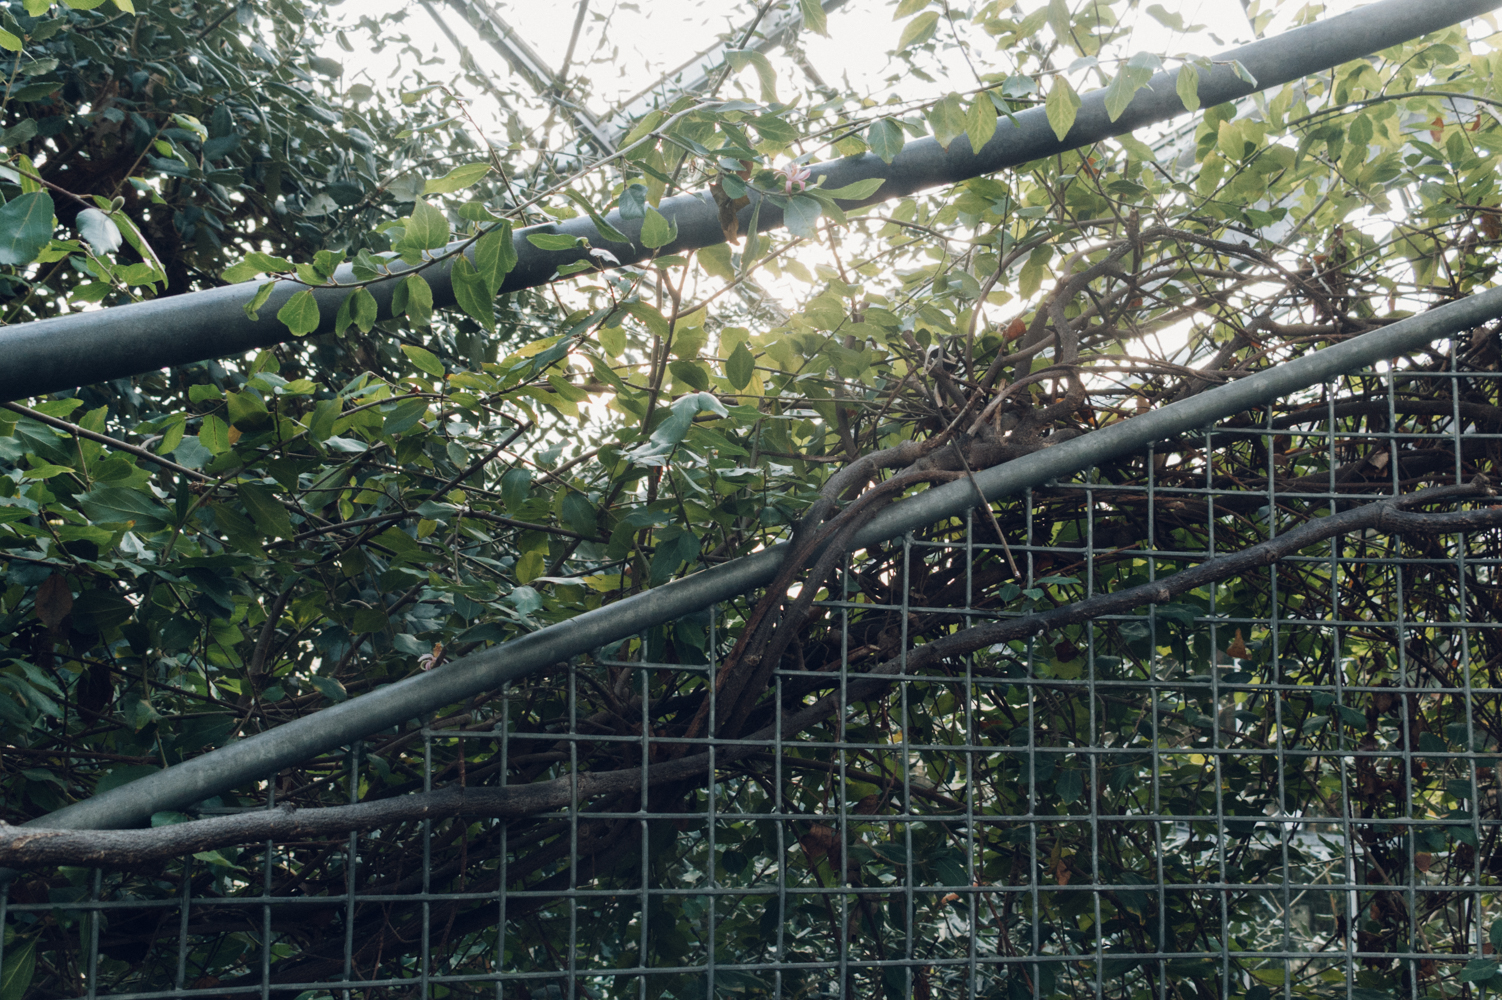 Hortus Botanicus Botanical Garden Twist Vine Tree Grow Fence